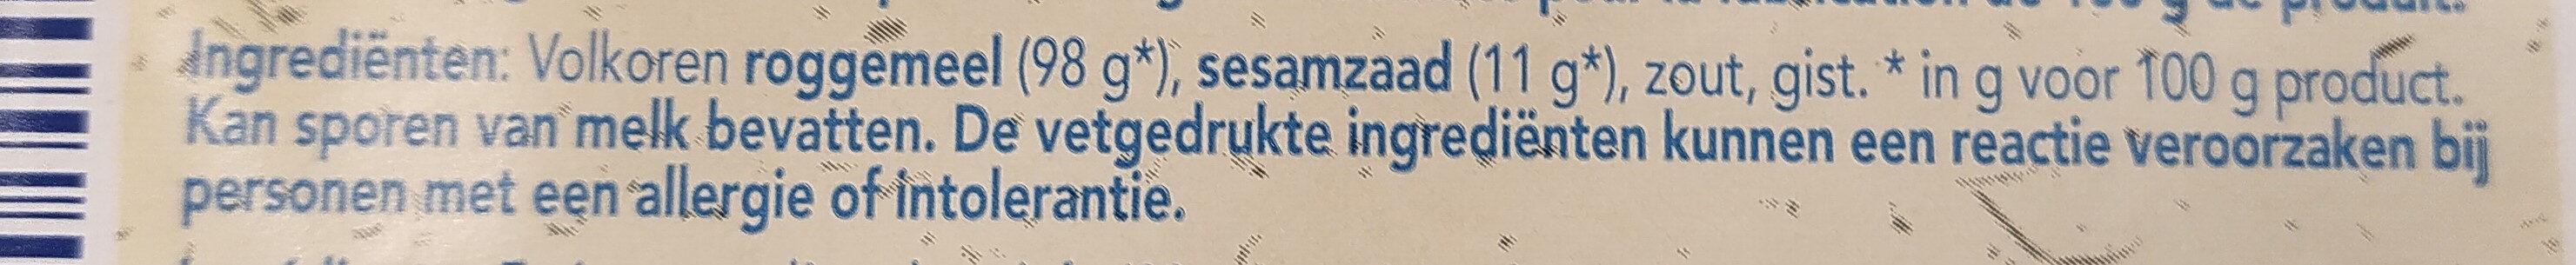 Dun rogge volkoren knäckebröd - Ingrediënten - nl